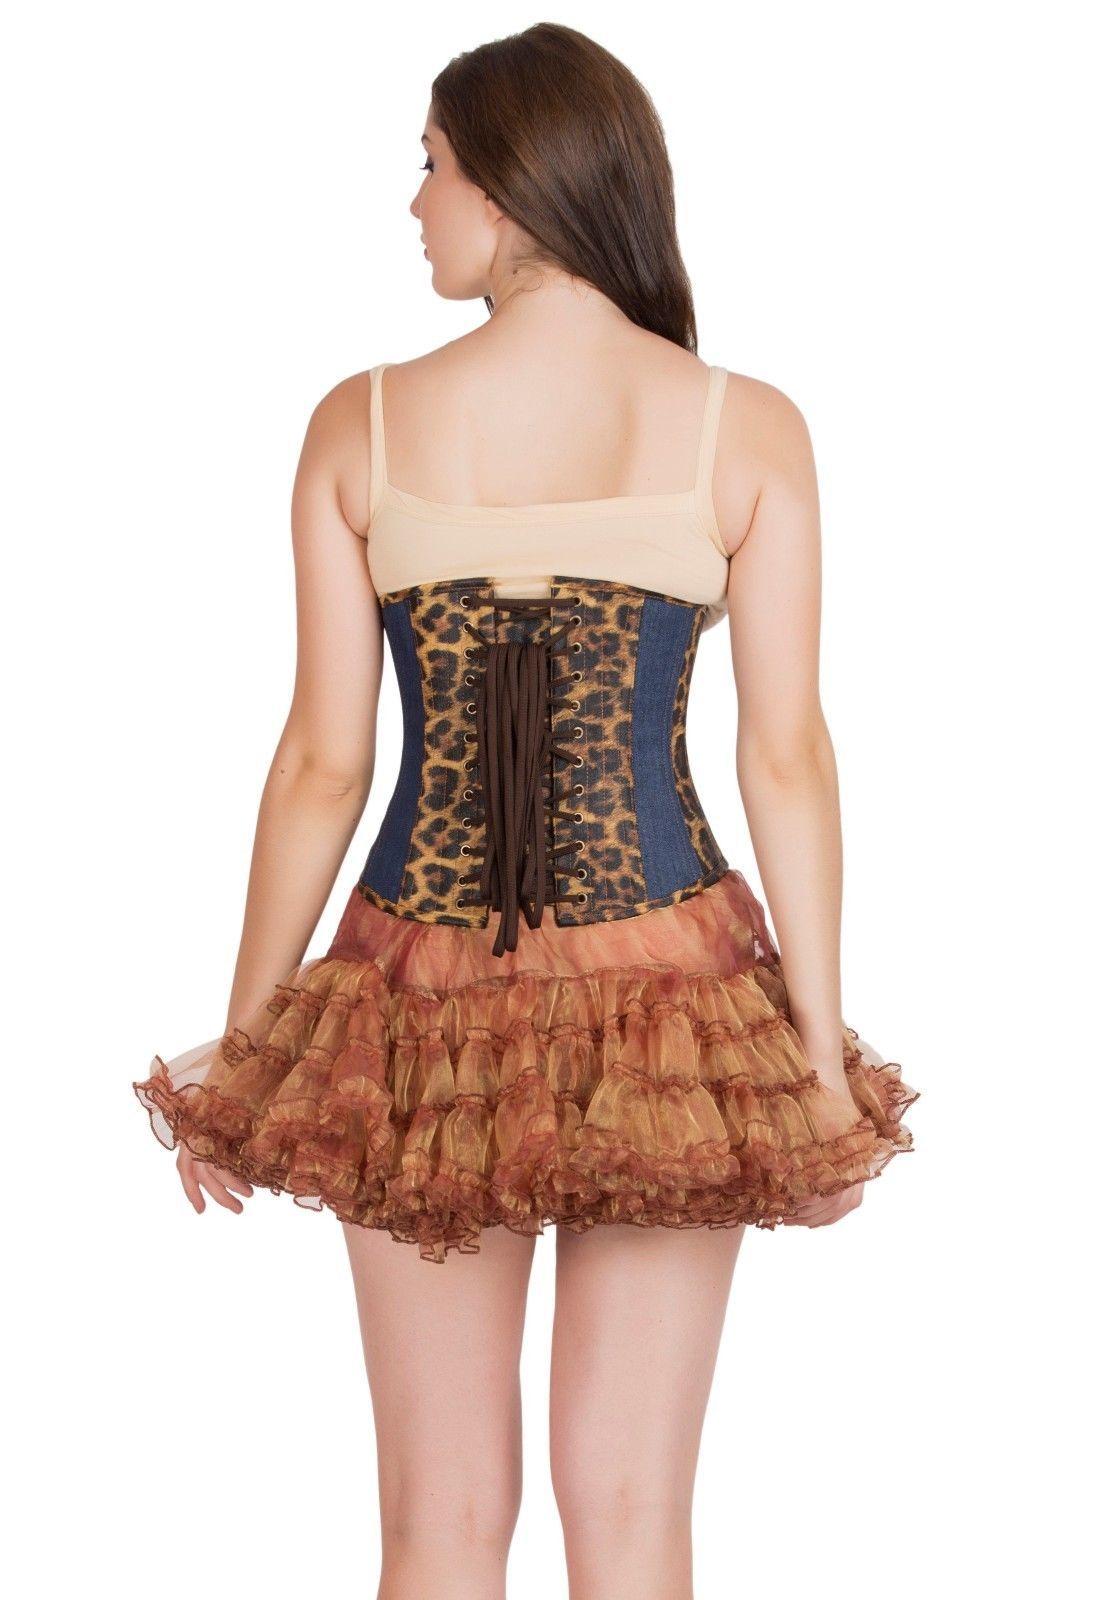 Leopard Print Leather Blue Denim Gothic Burlesque Costume Underbust Corset Top